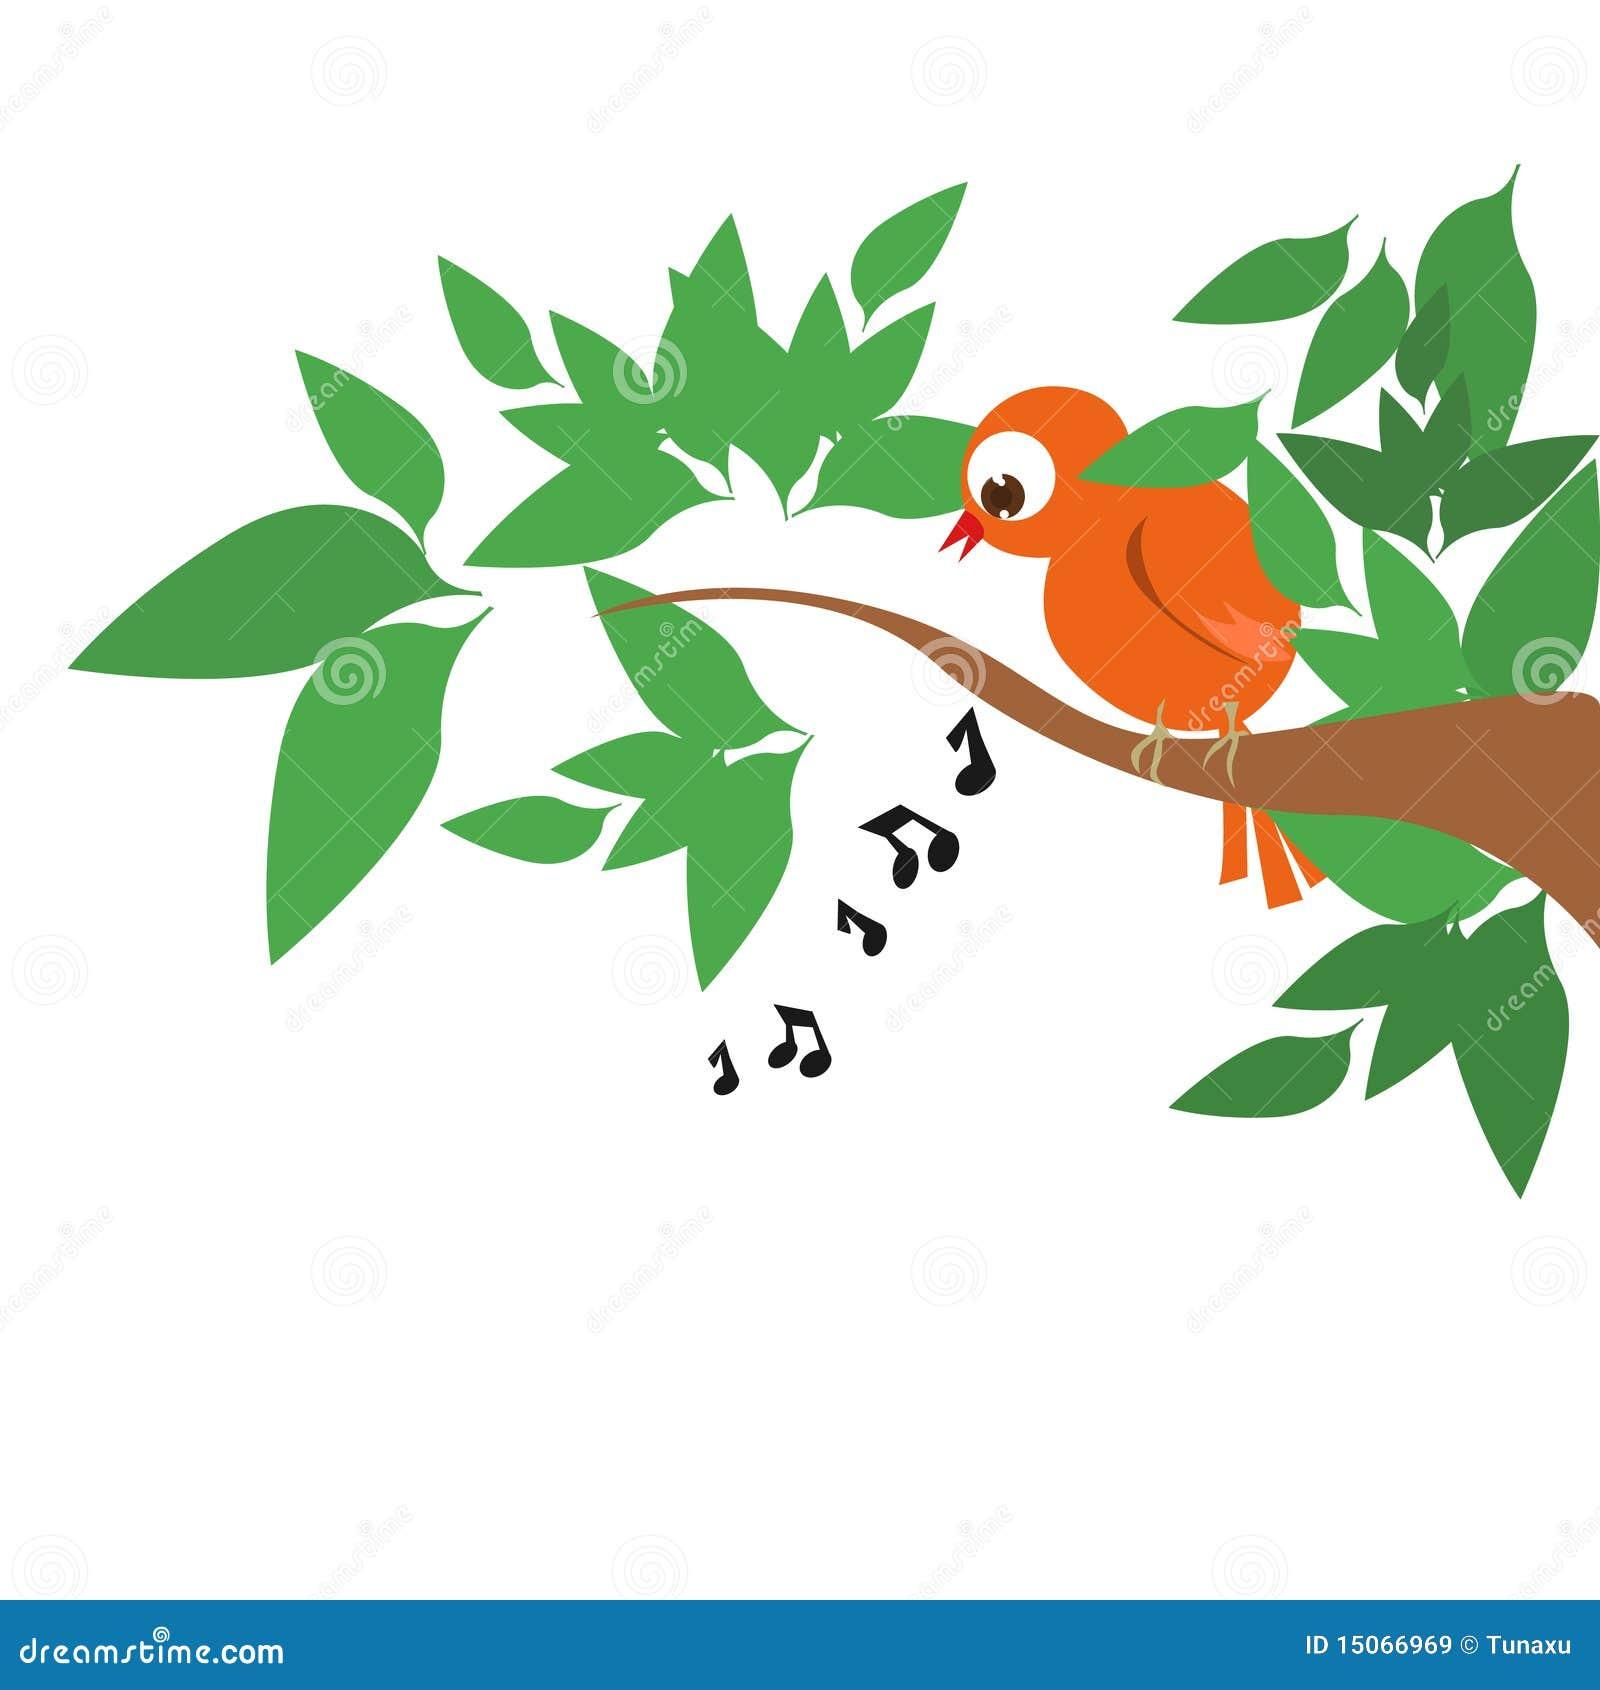 Singing bird on tree